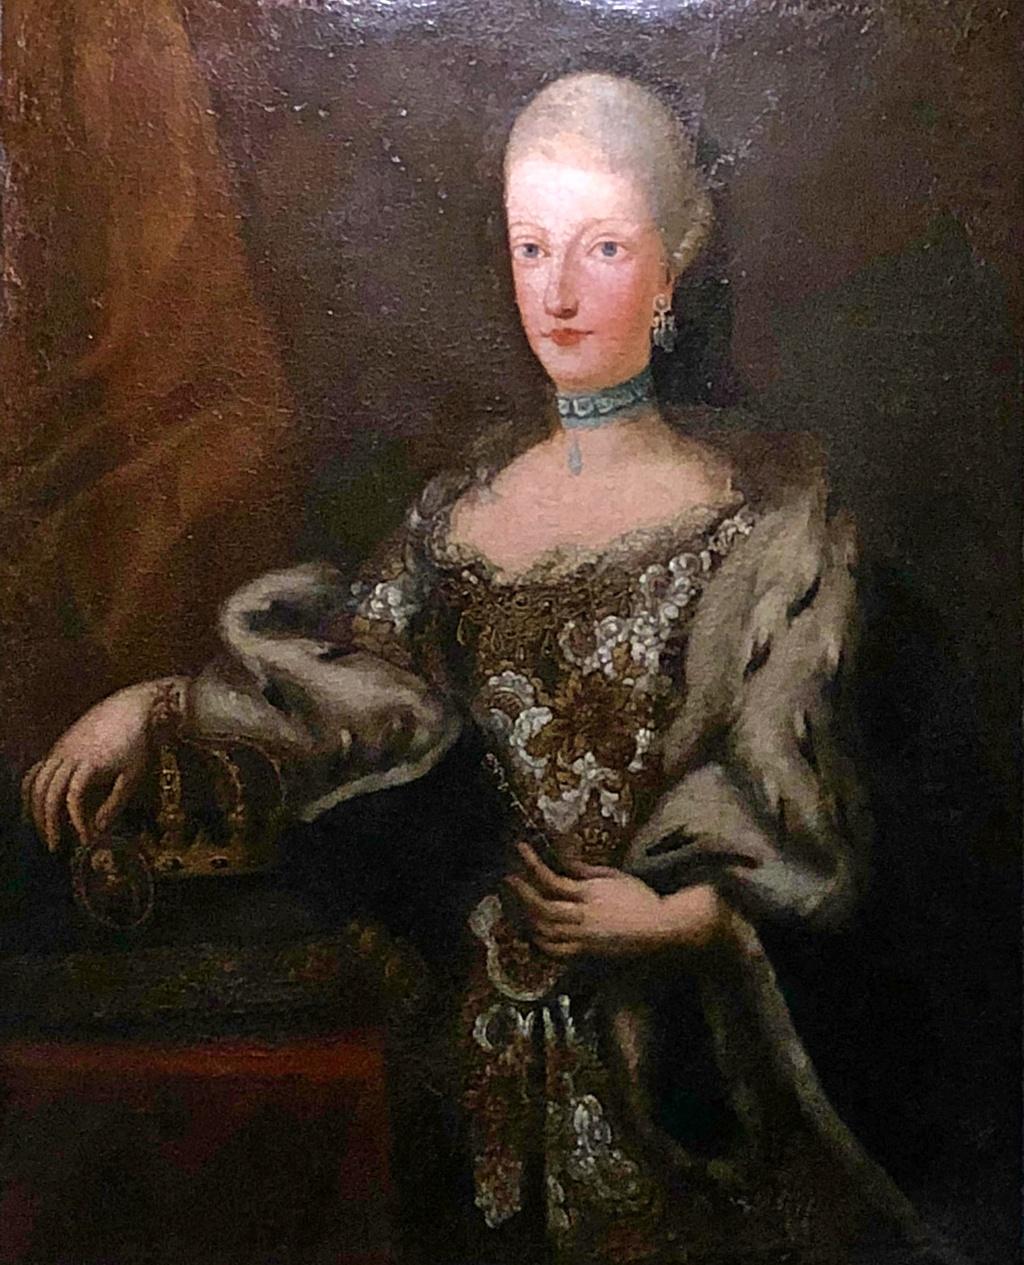 La reine Marie-Caroline de Naples - Page 7 4ac62f10